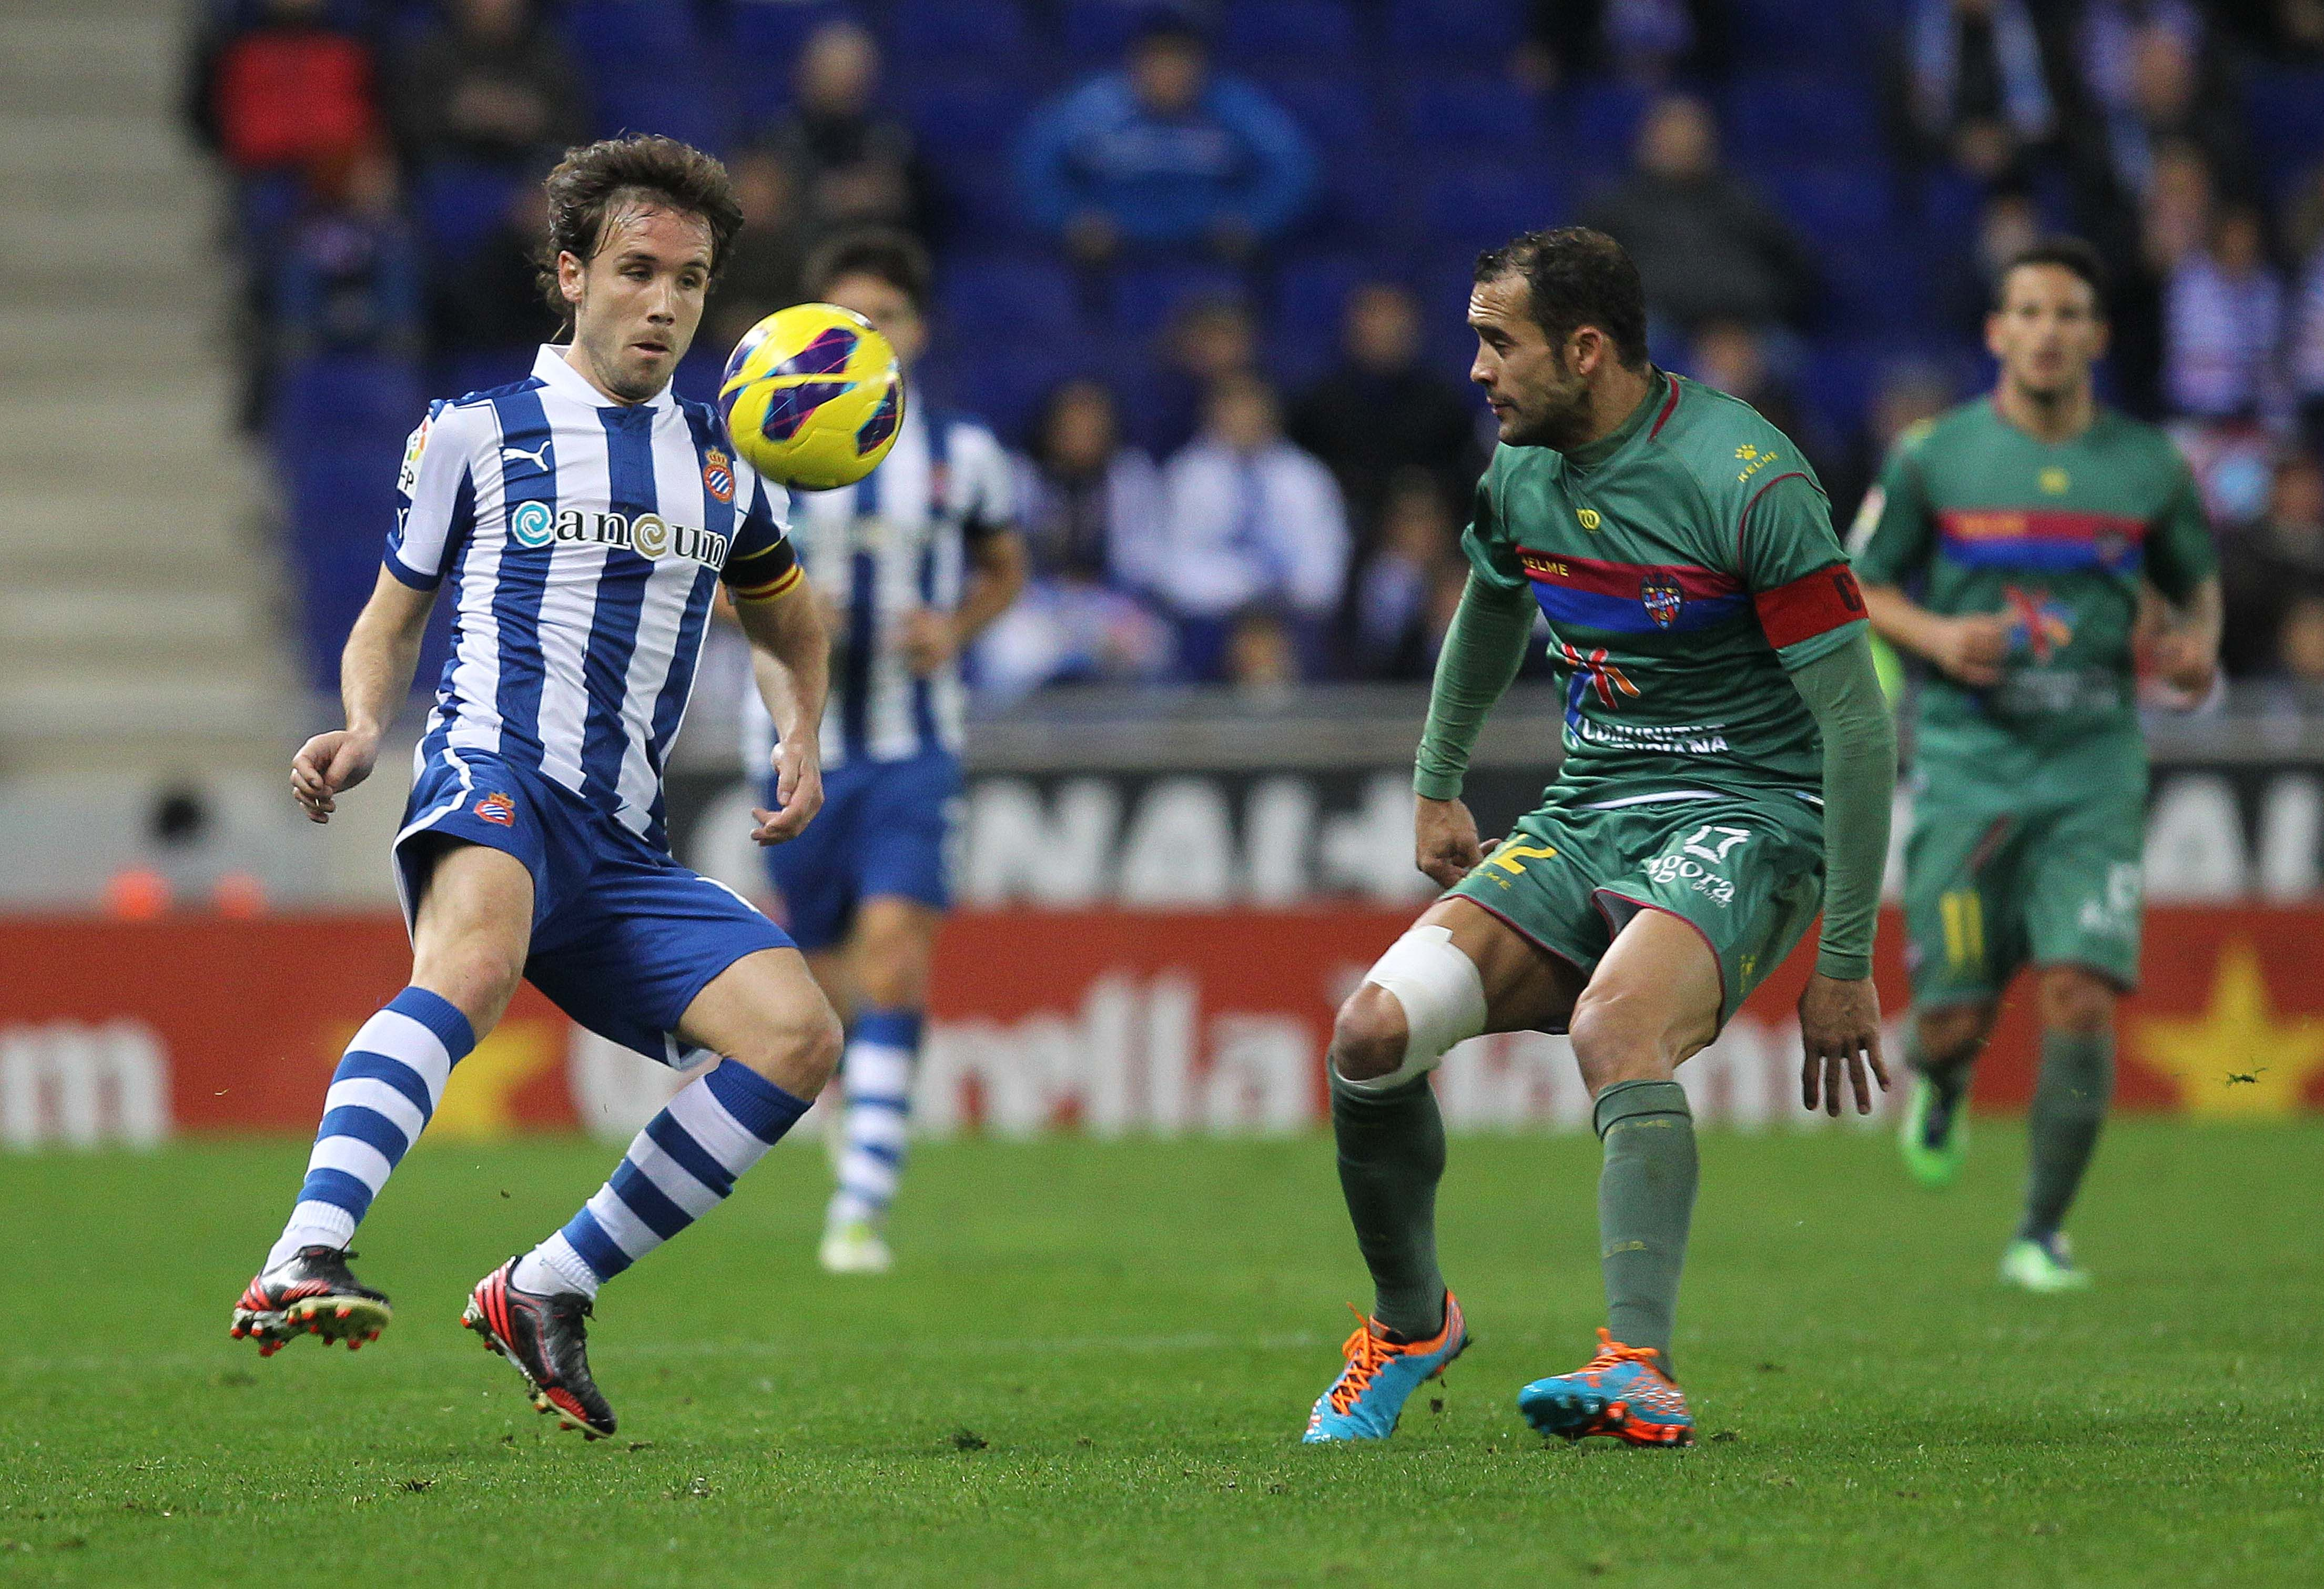 RCD Espanyol player #football #liga